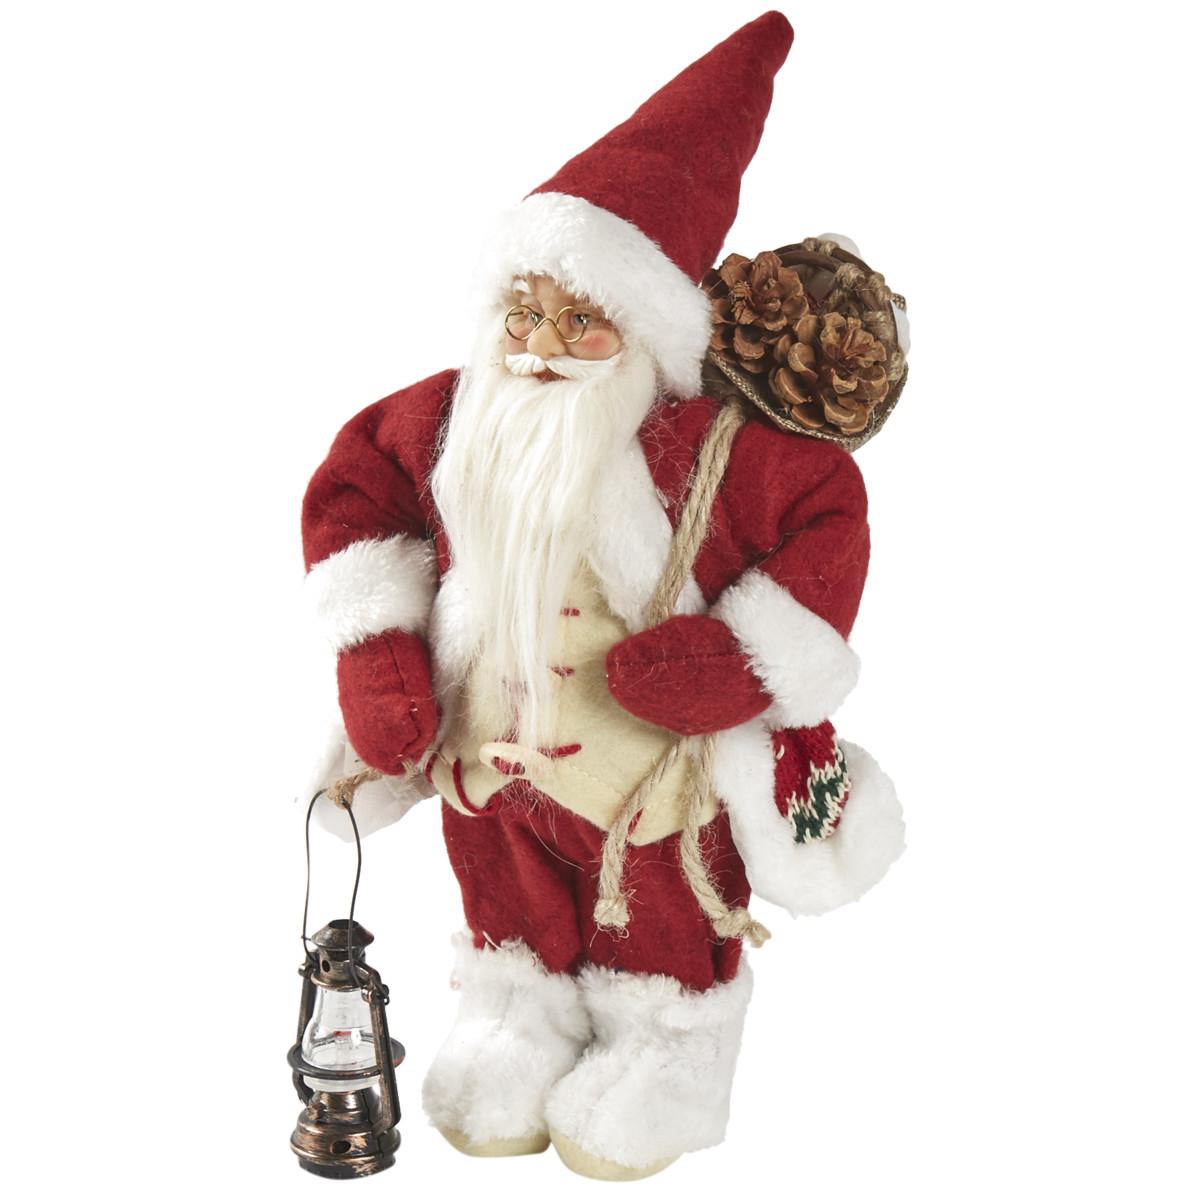 Декоративная фигура «Дед Мороз» 30 см